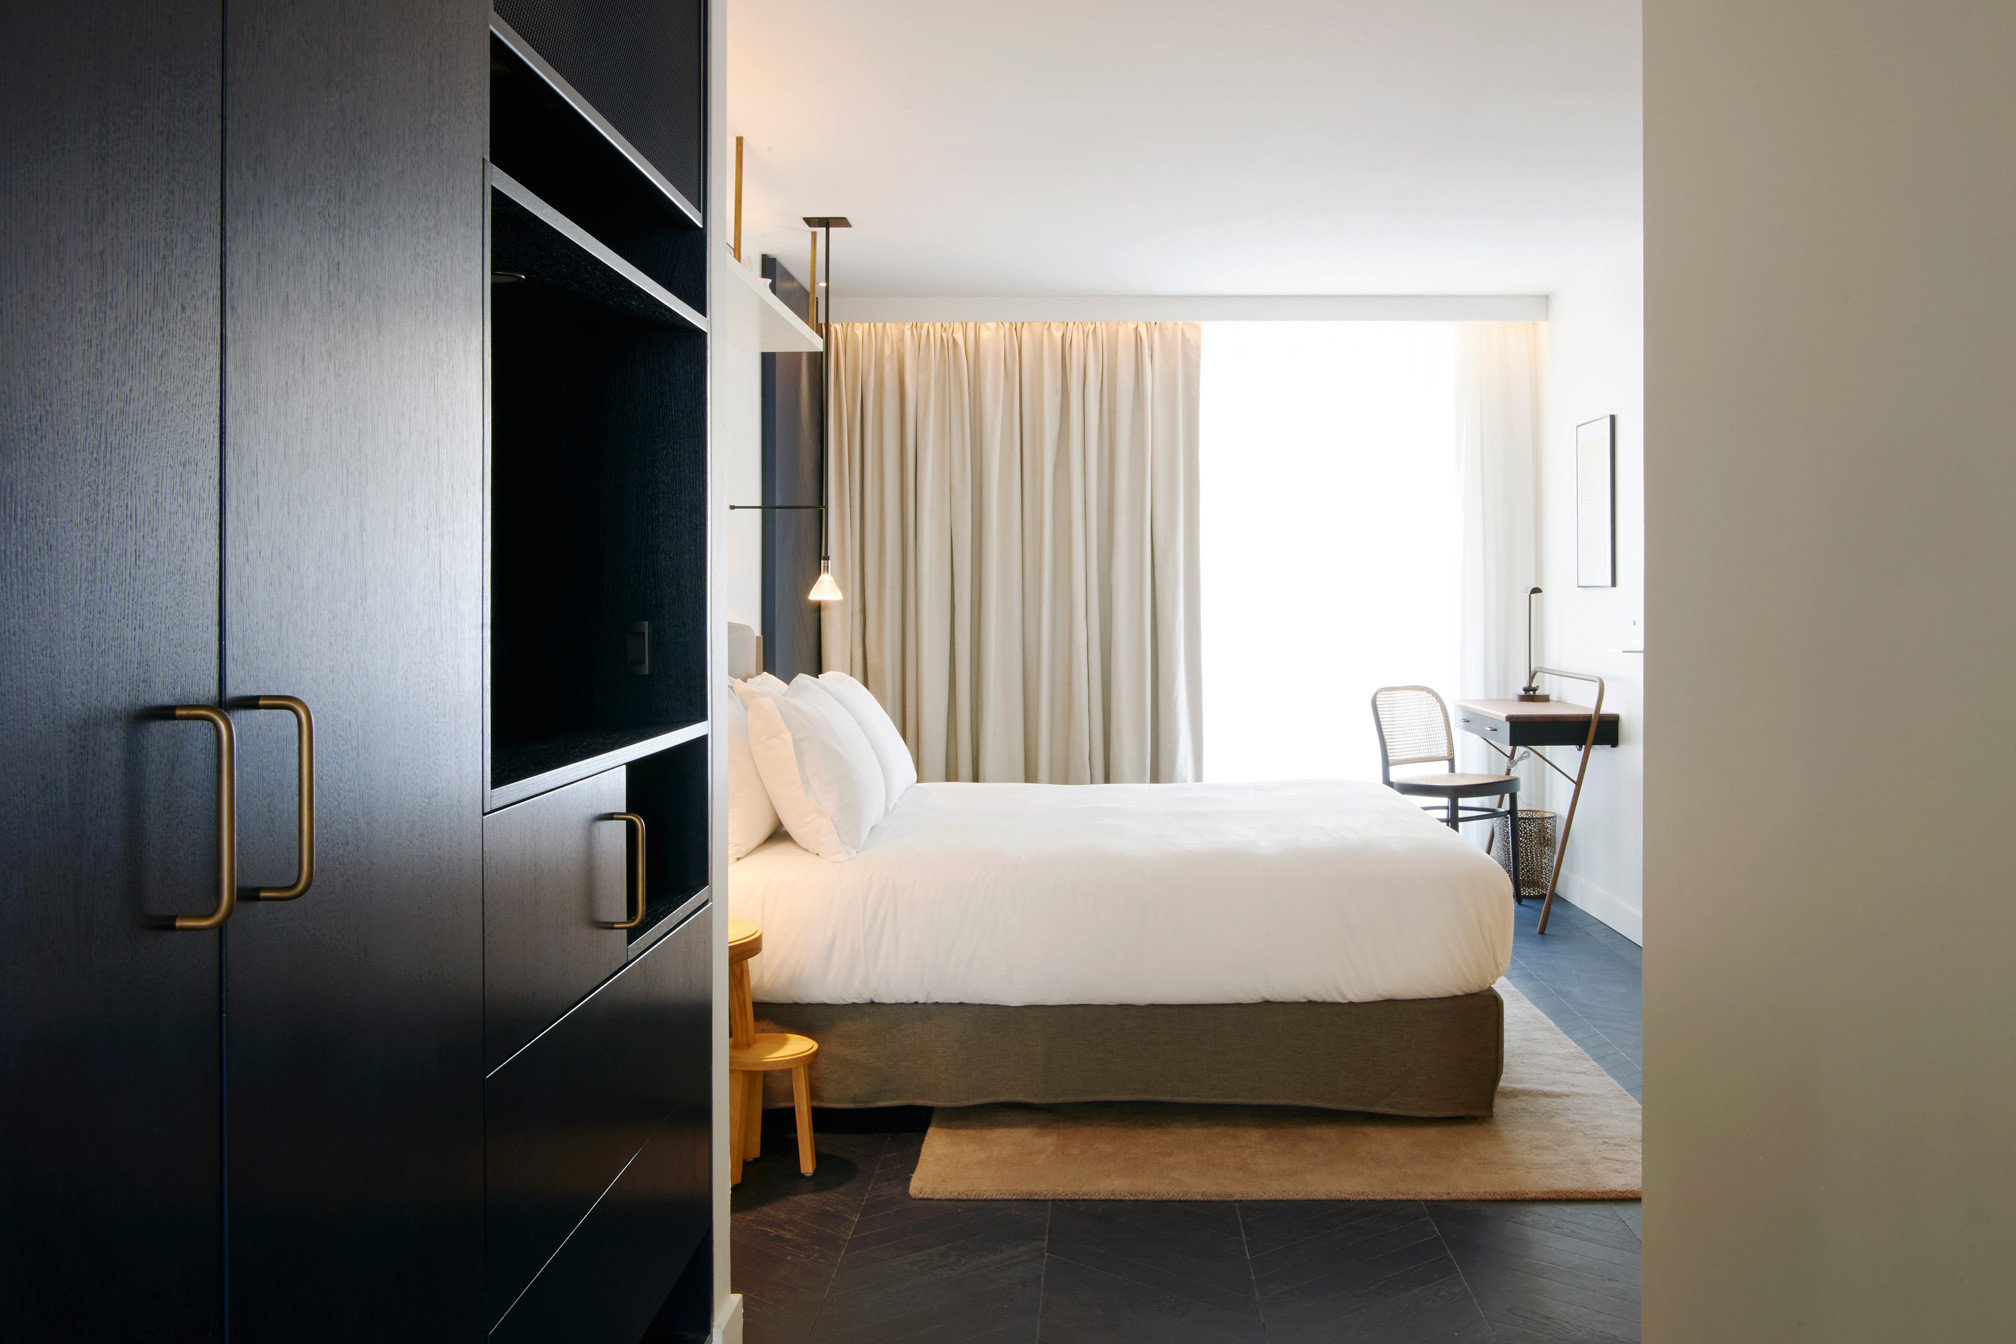 Hotels indoor wall floor room property Bedroom house bed interior design home furniture living room Suite Design real estate apartment